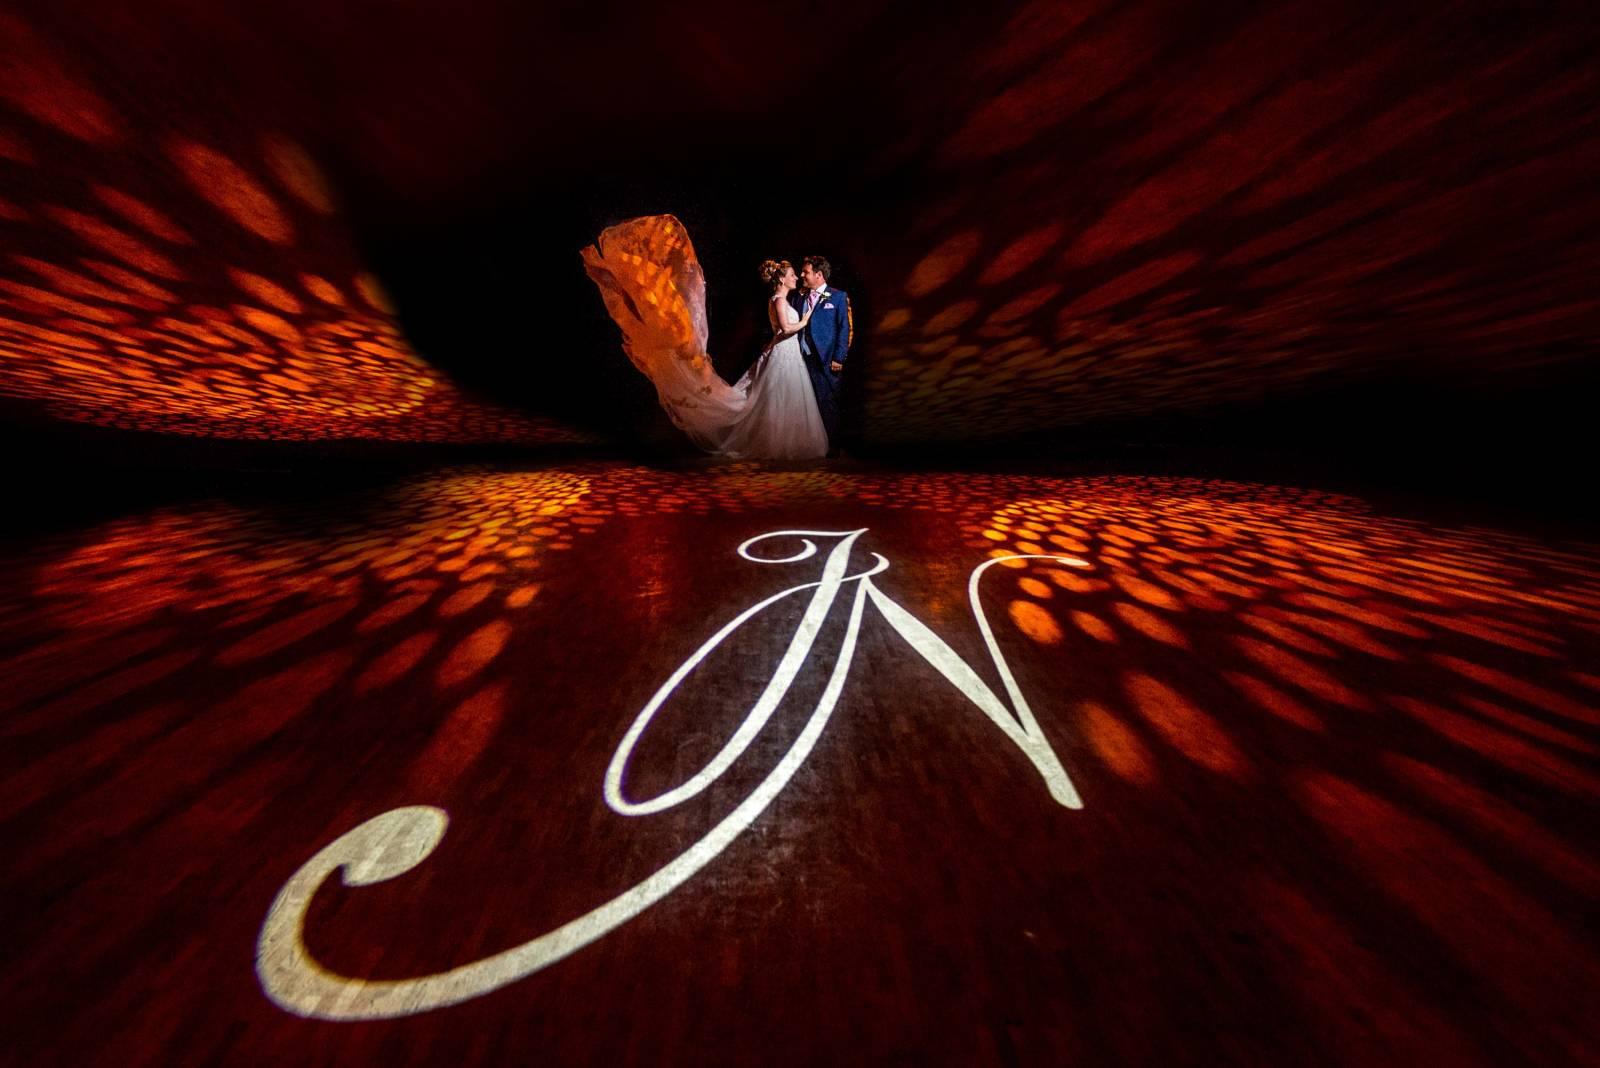 Fotografie Melody - Huwelijksfotograaf - Trouwfotograaf - House of Weddings - 5